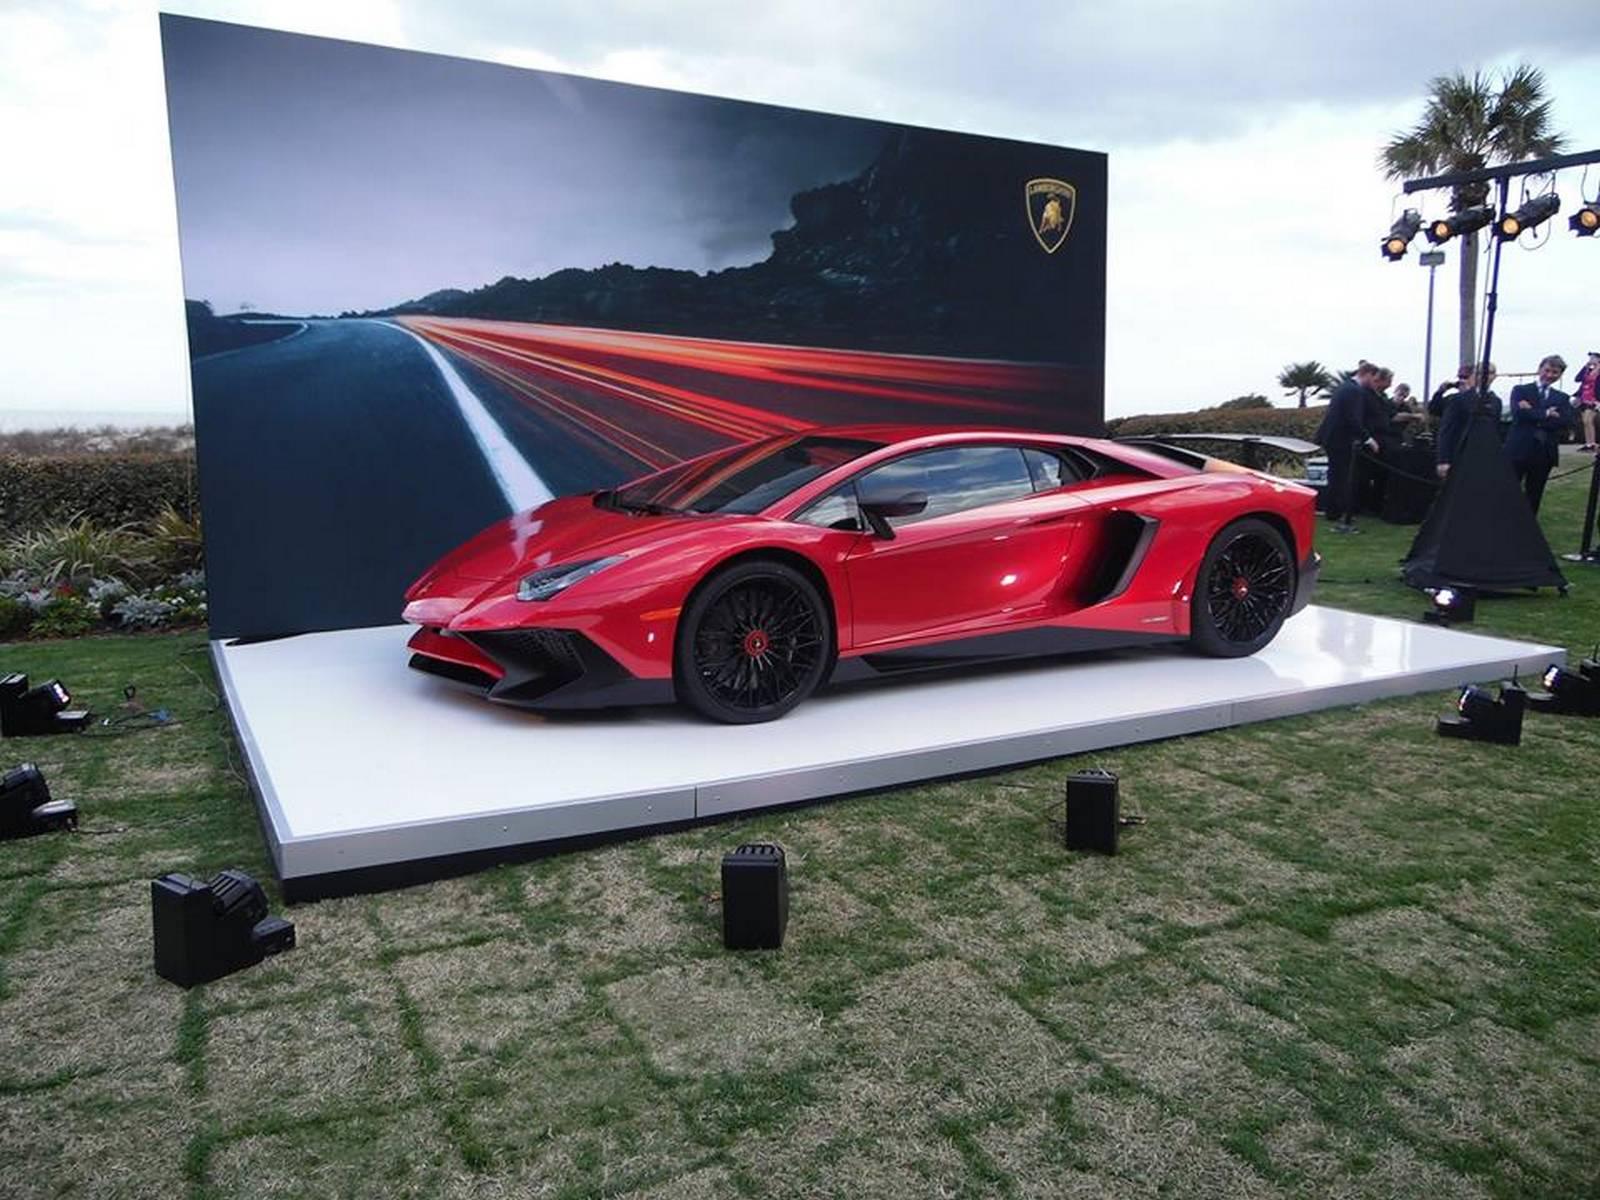 Amelia Island Concours DElegance Highlights GTspirit - Amelia island car show